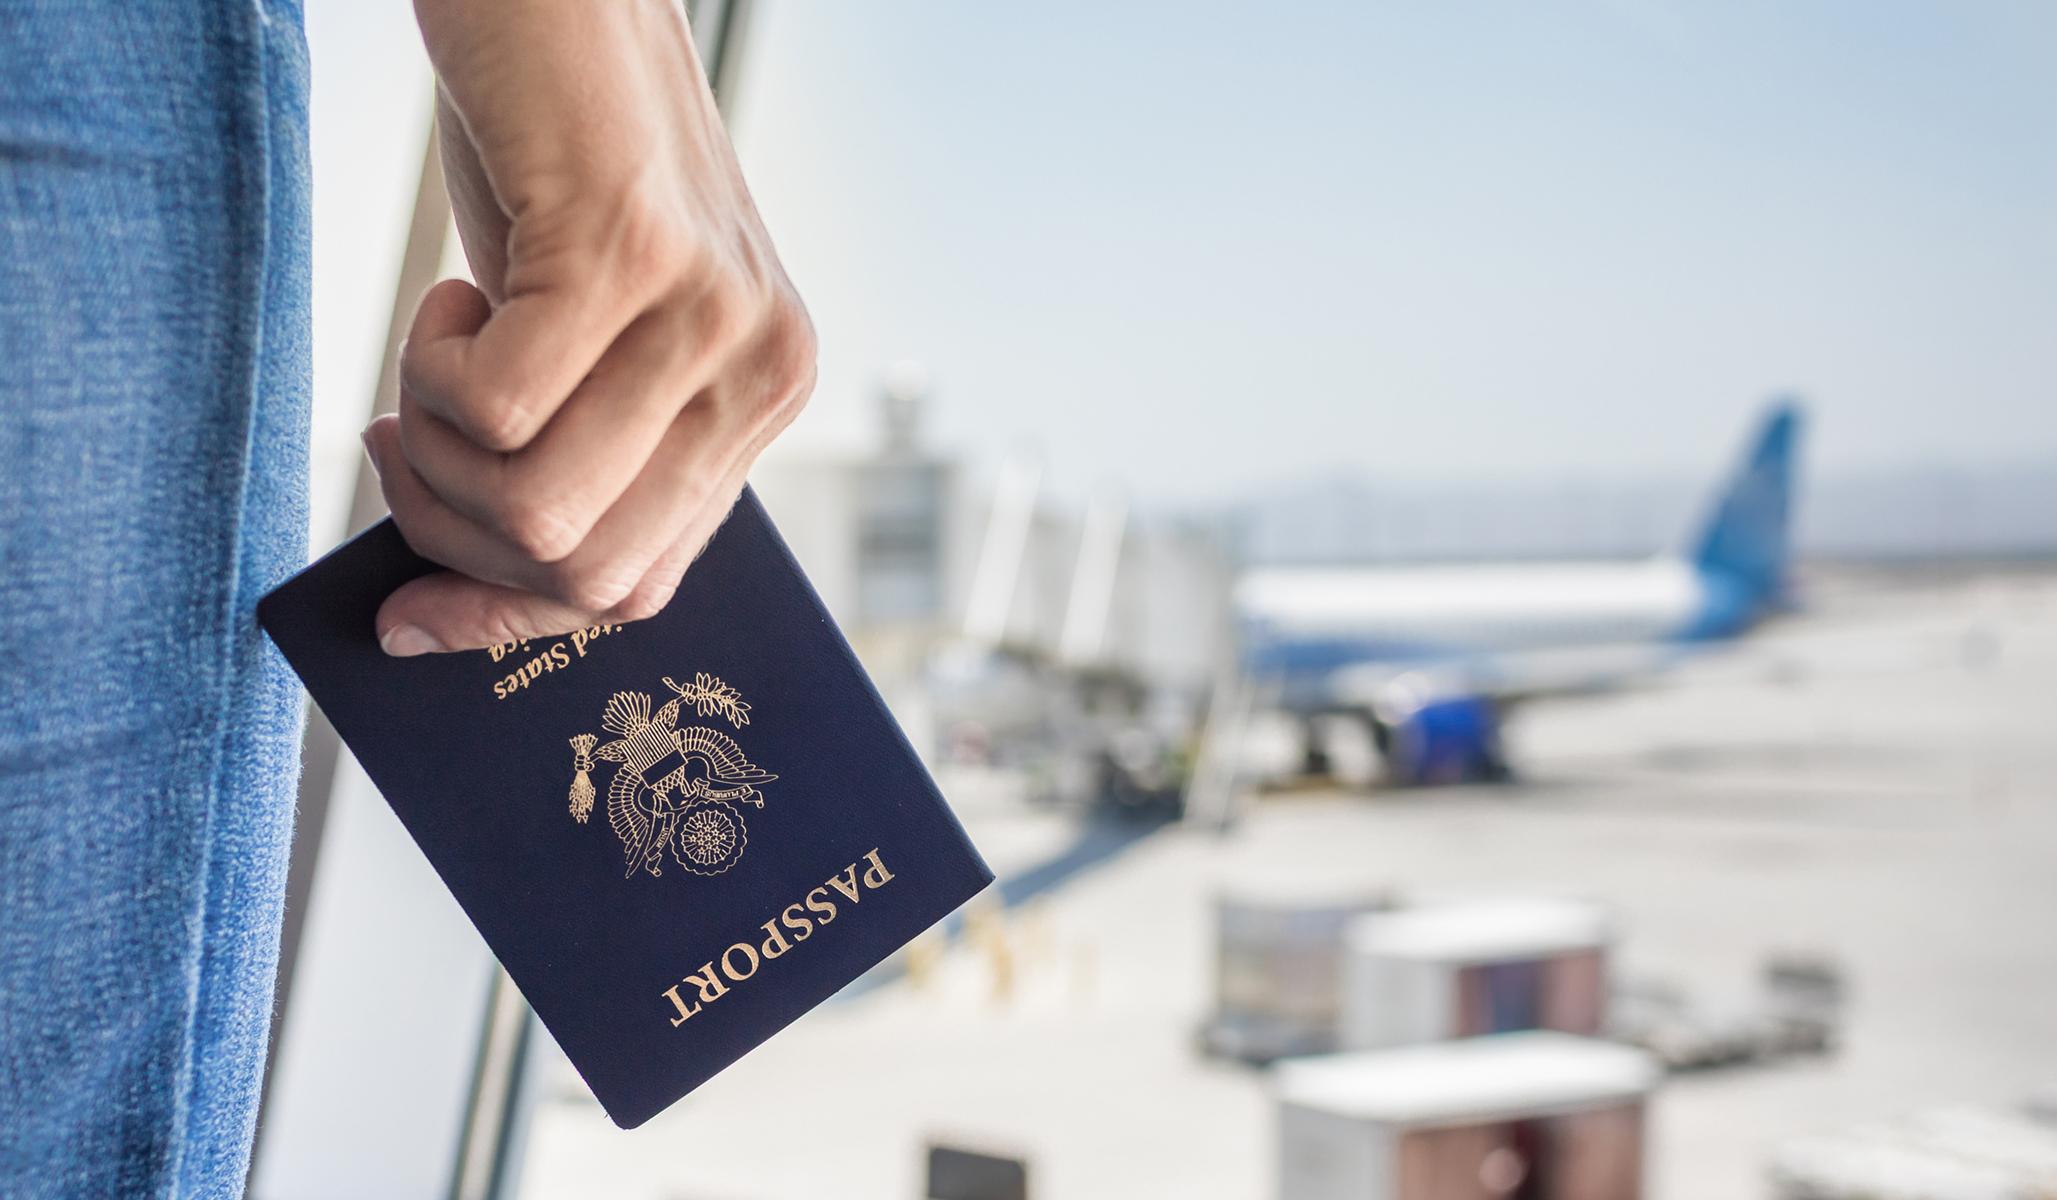 State Department Issues First Gender-Neutral Passport